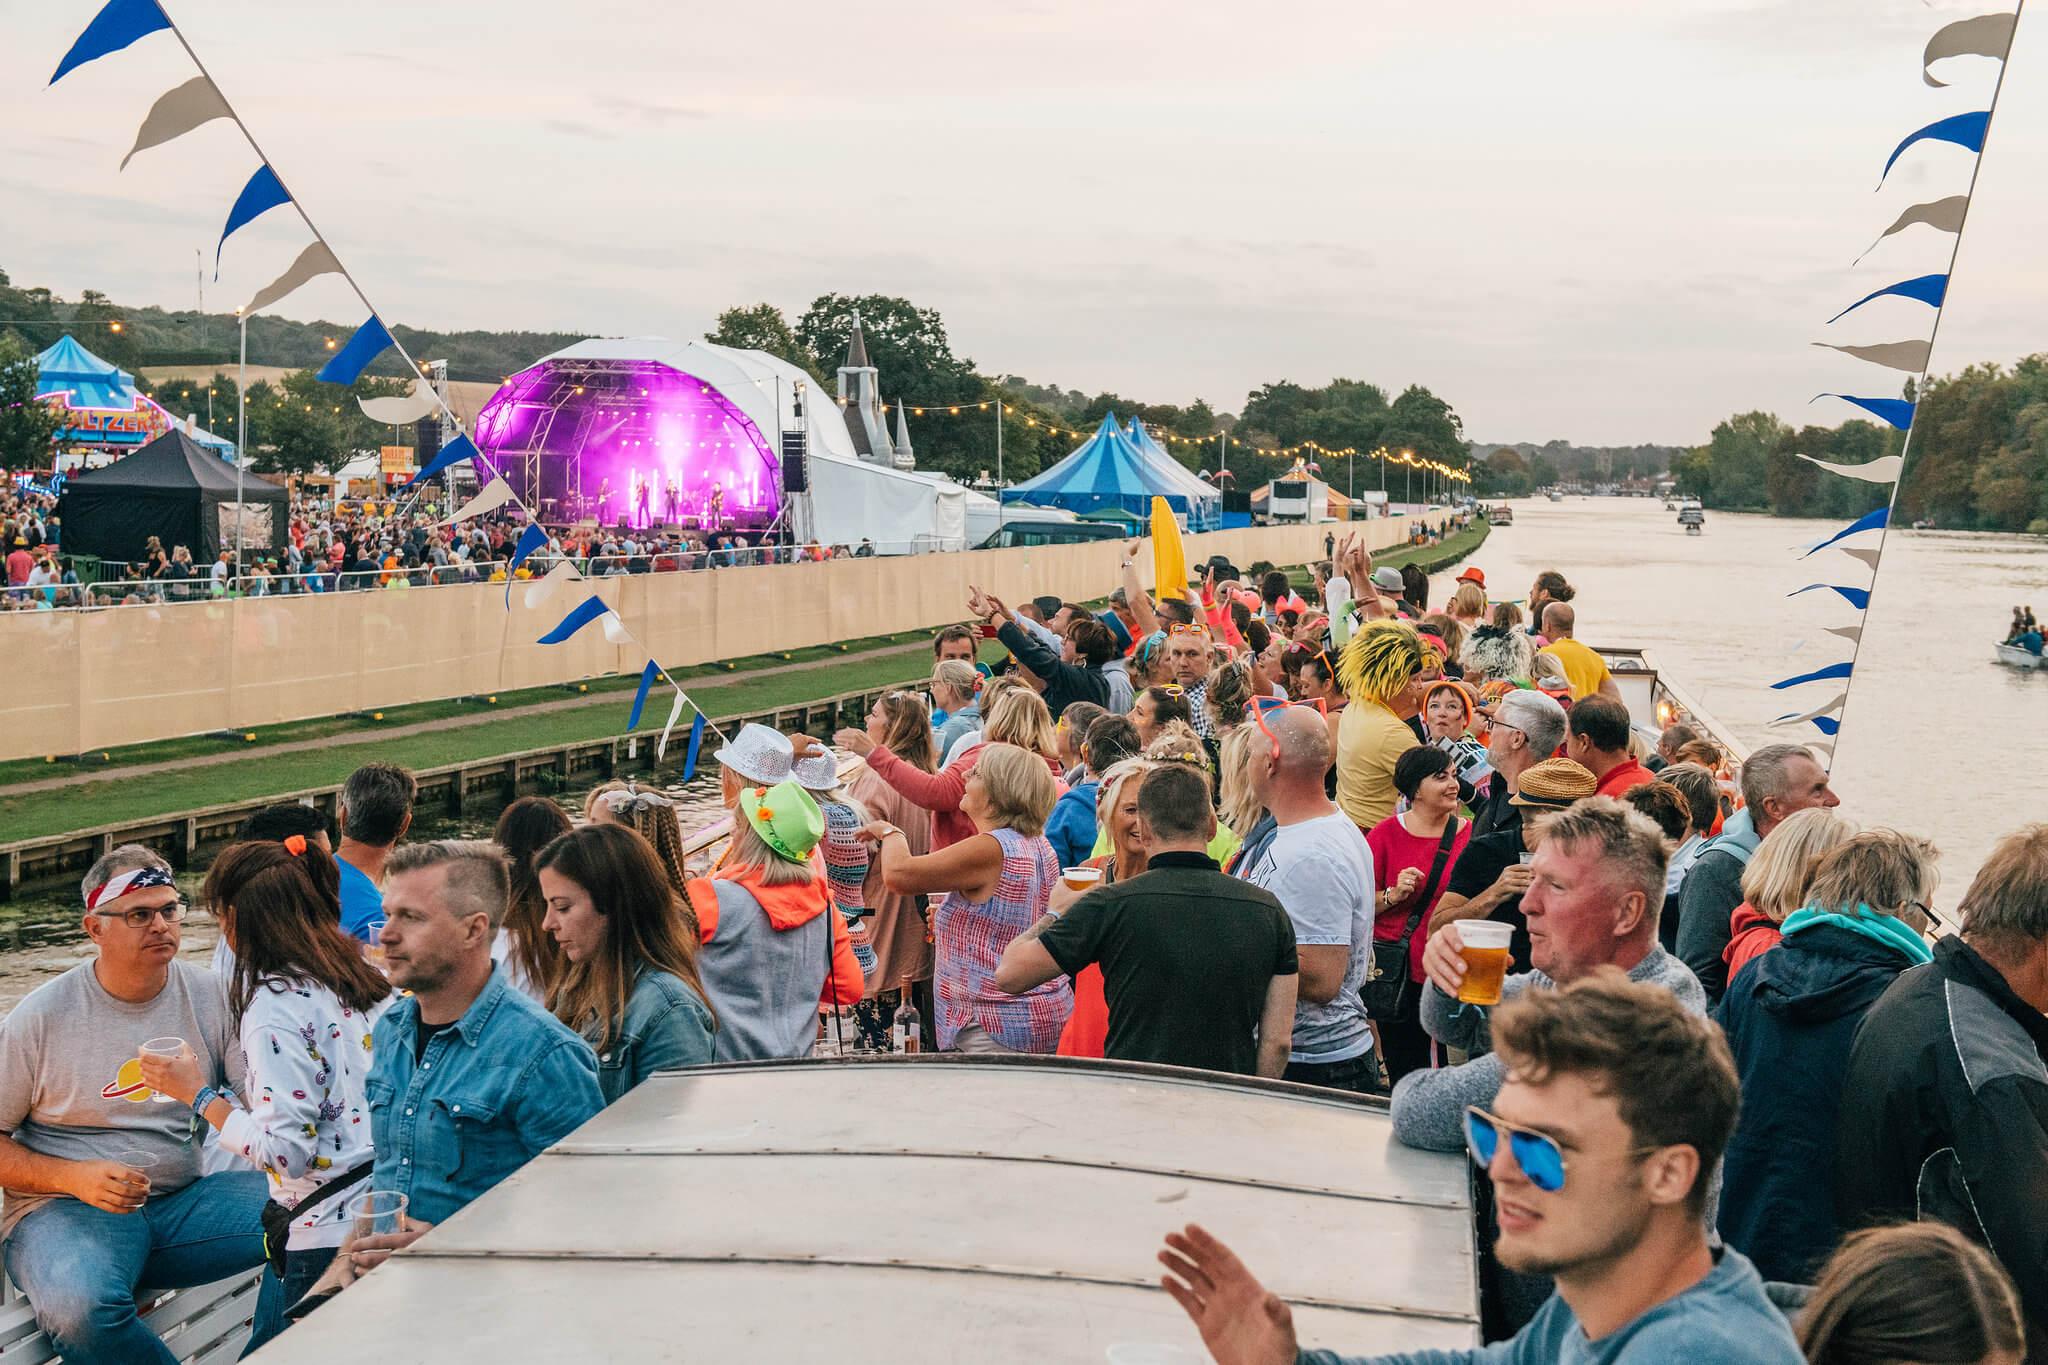 5 Things That Makes Rewind Festival So Unique - Festicket Magazine